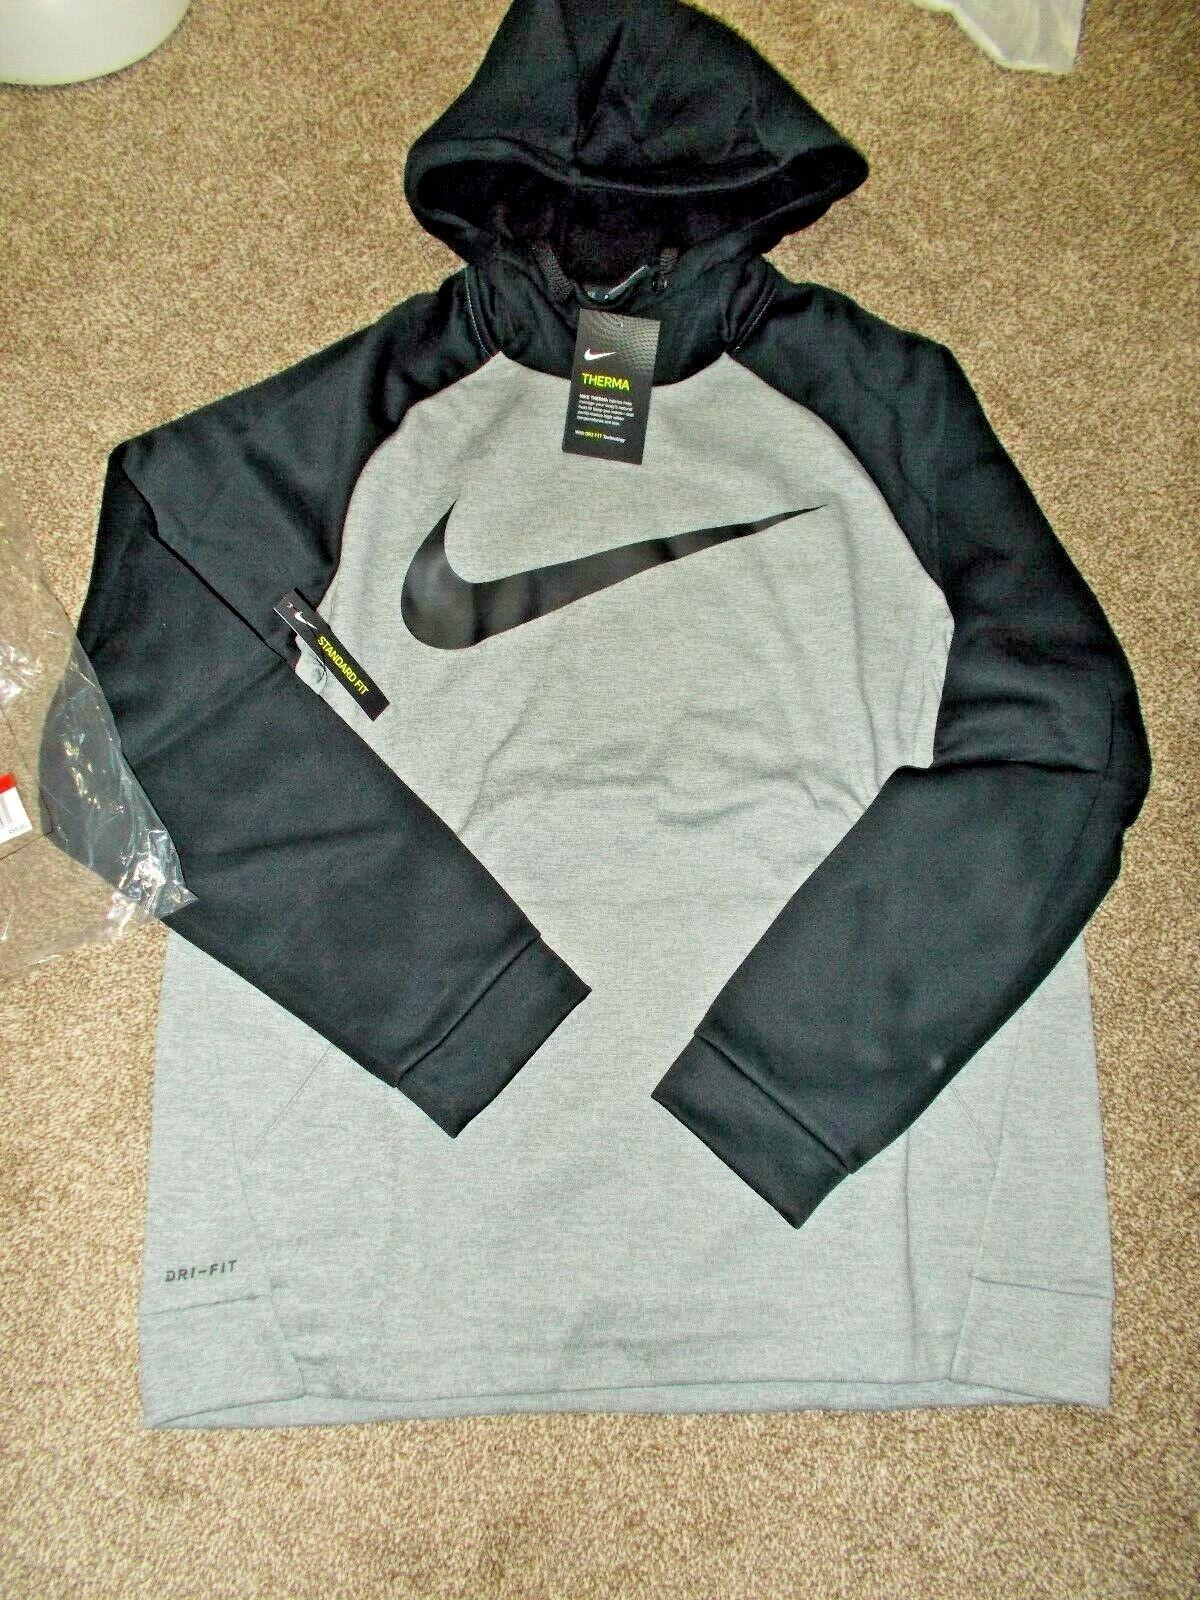 NEW Men/'s Size L NIKE Sweatshirt Hoodie Warm Therma Gray Black MSRP $55 NWT